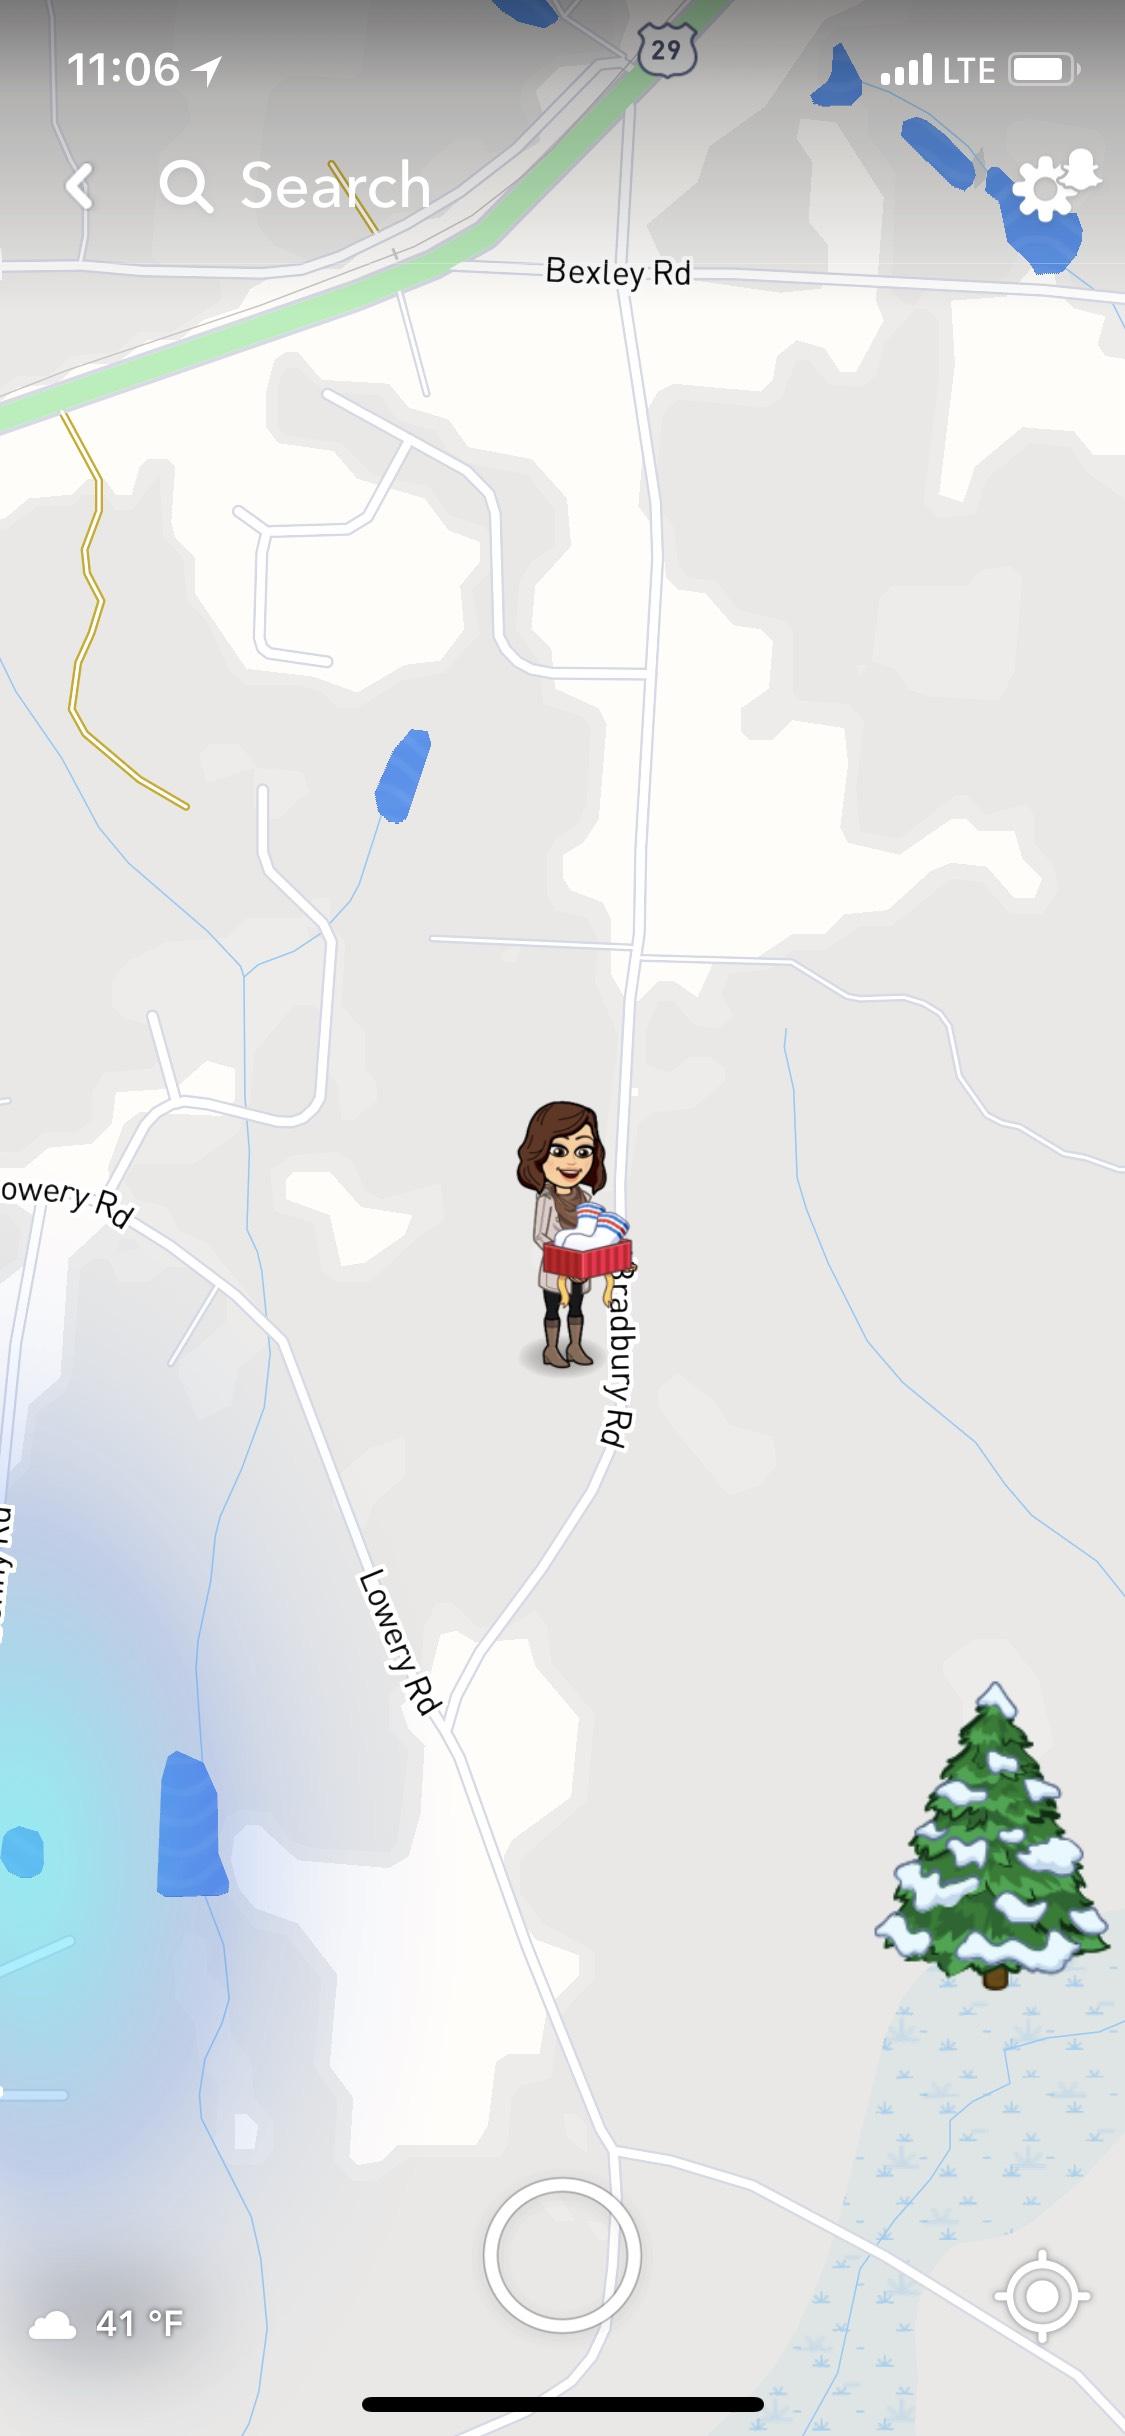 how to use snapchat map bitmoji